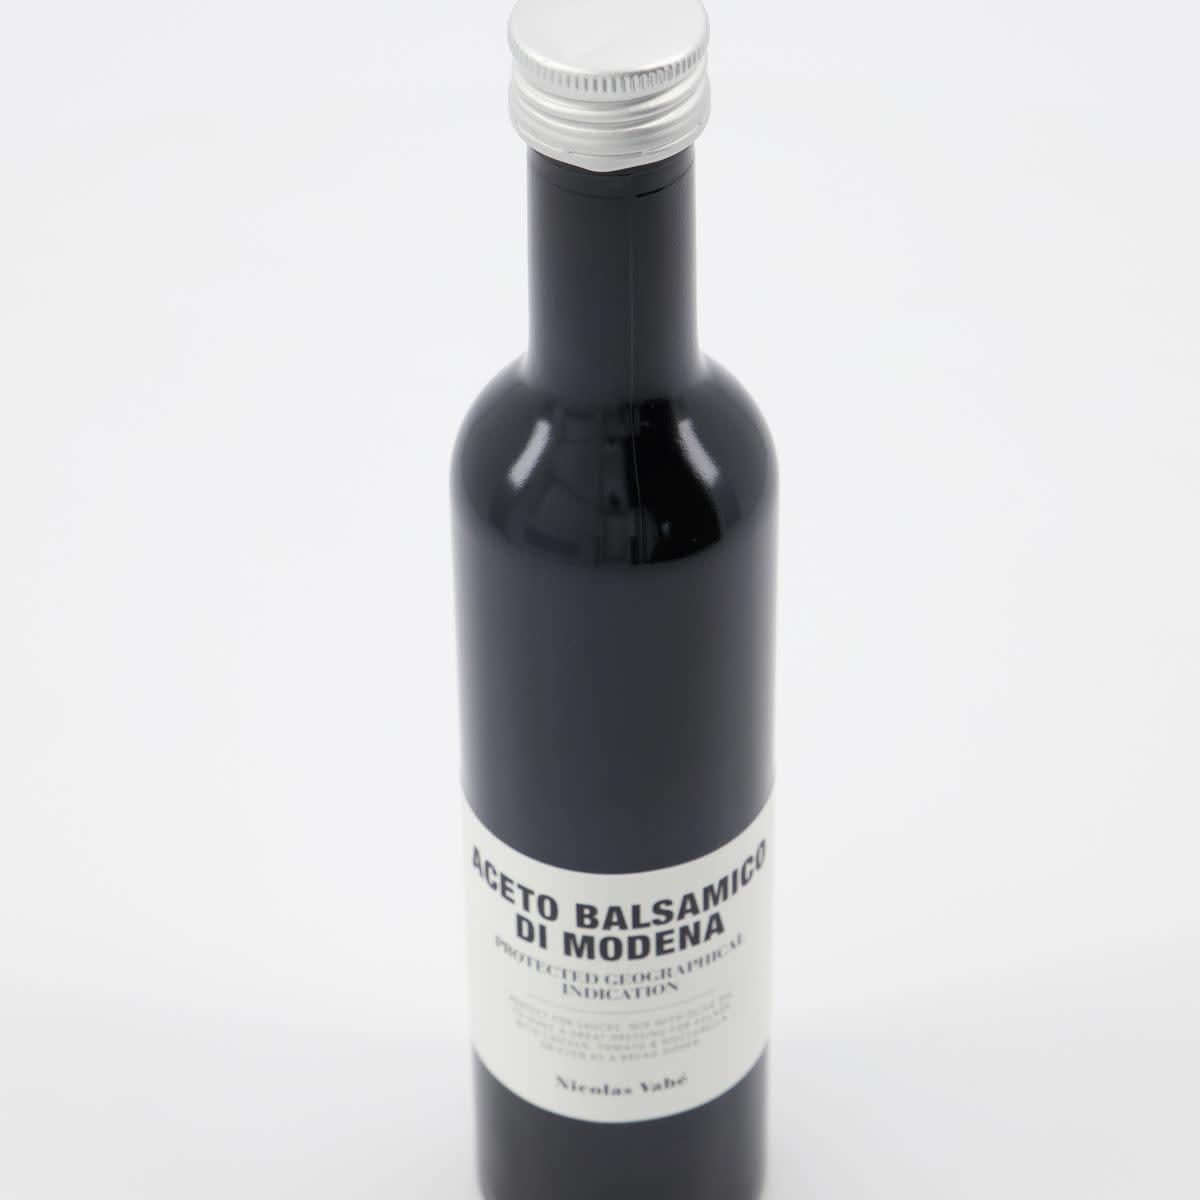 Nicolas Vahé Aceto Balsamico di Modena 250 ml.